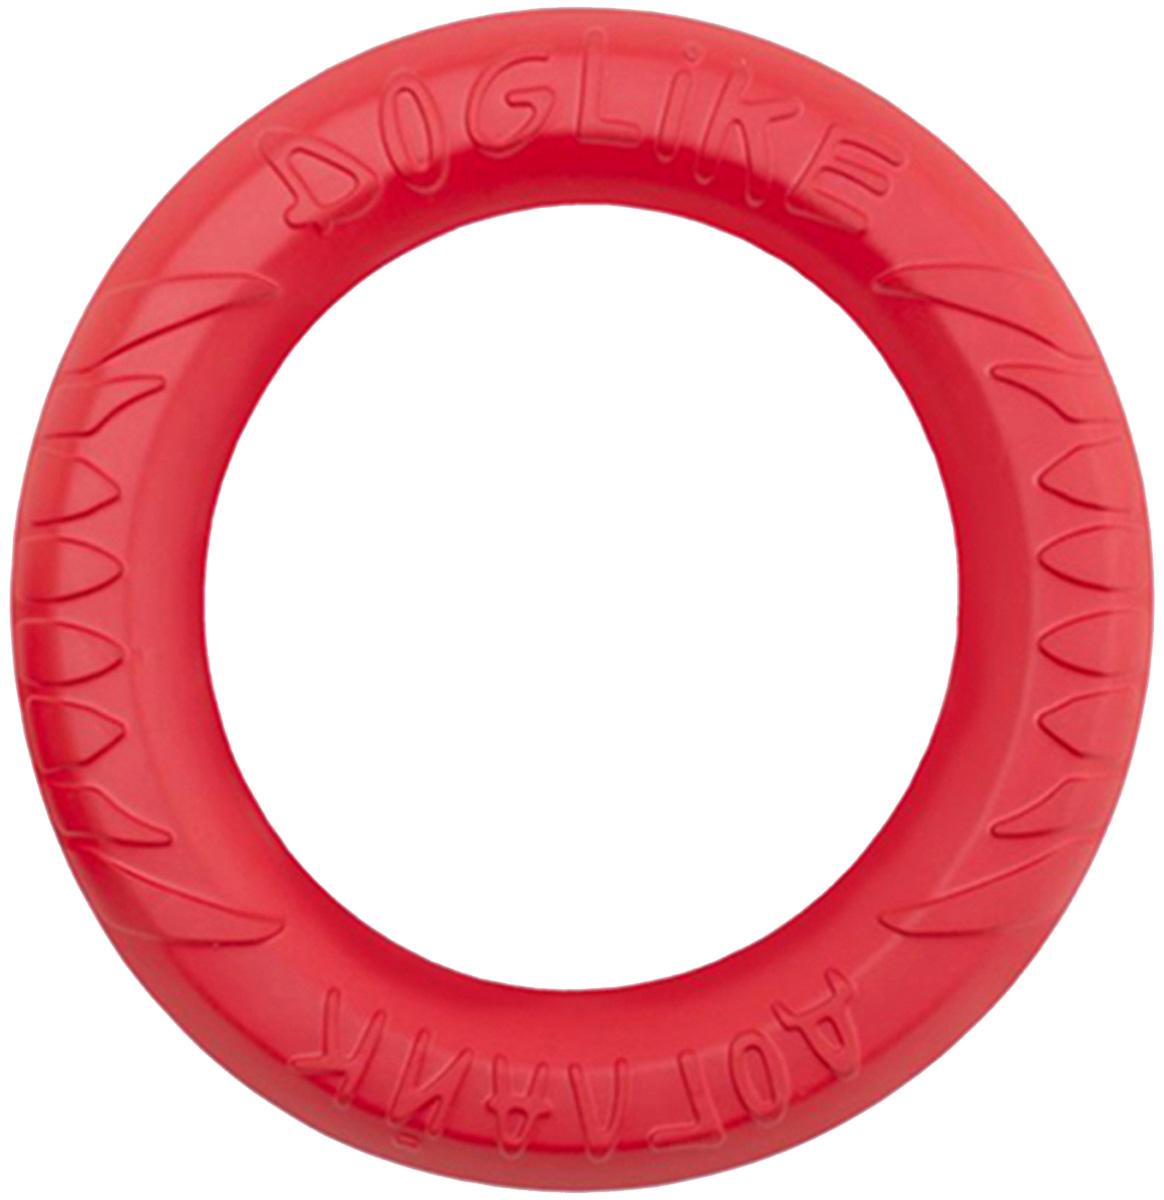 Снаряд Tug & Twist кольцо восьмигранное миниатюрное Doglike коралловый (1 шт)